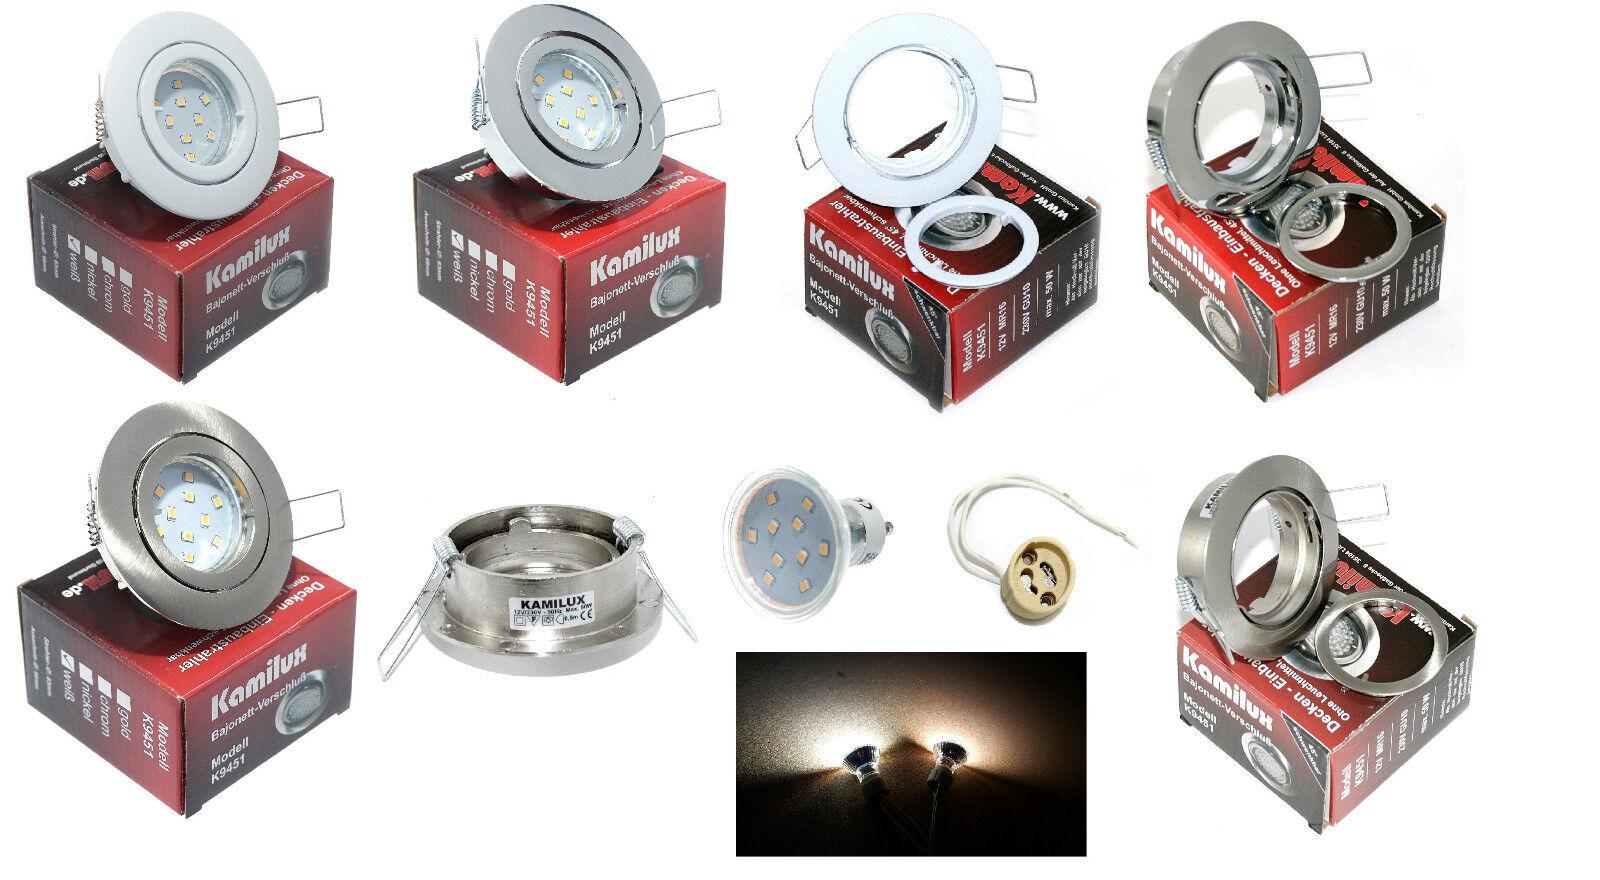 LED soffitto faretti LANA 230v 10er gu10 SMD 3 Watt = 25 Watt